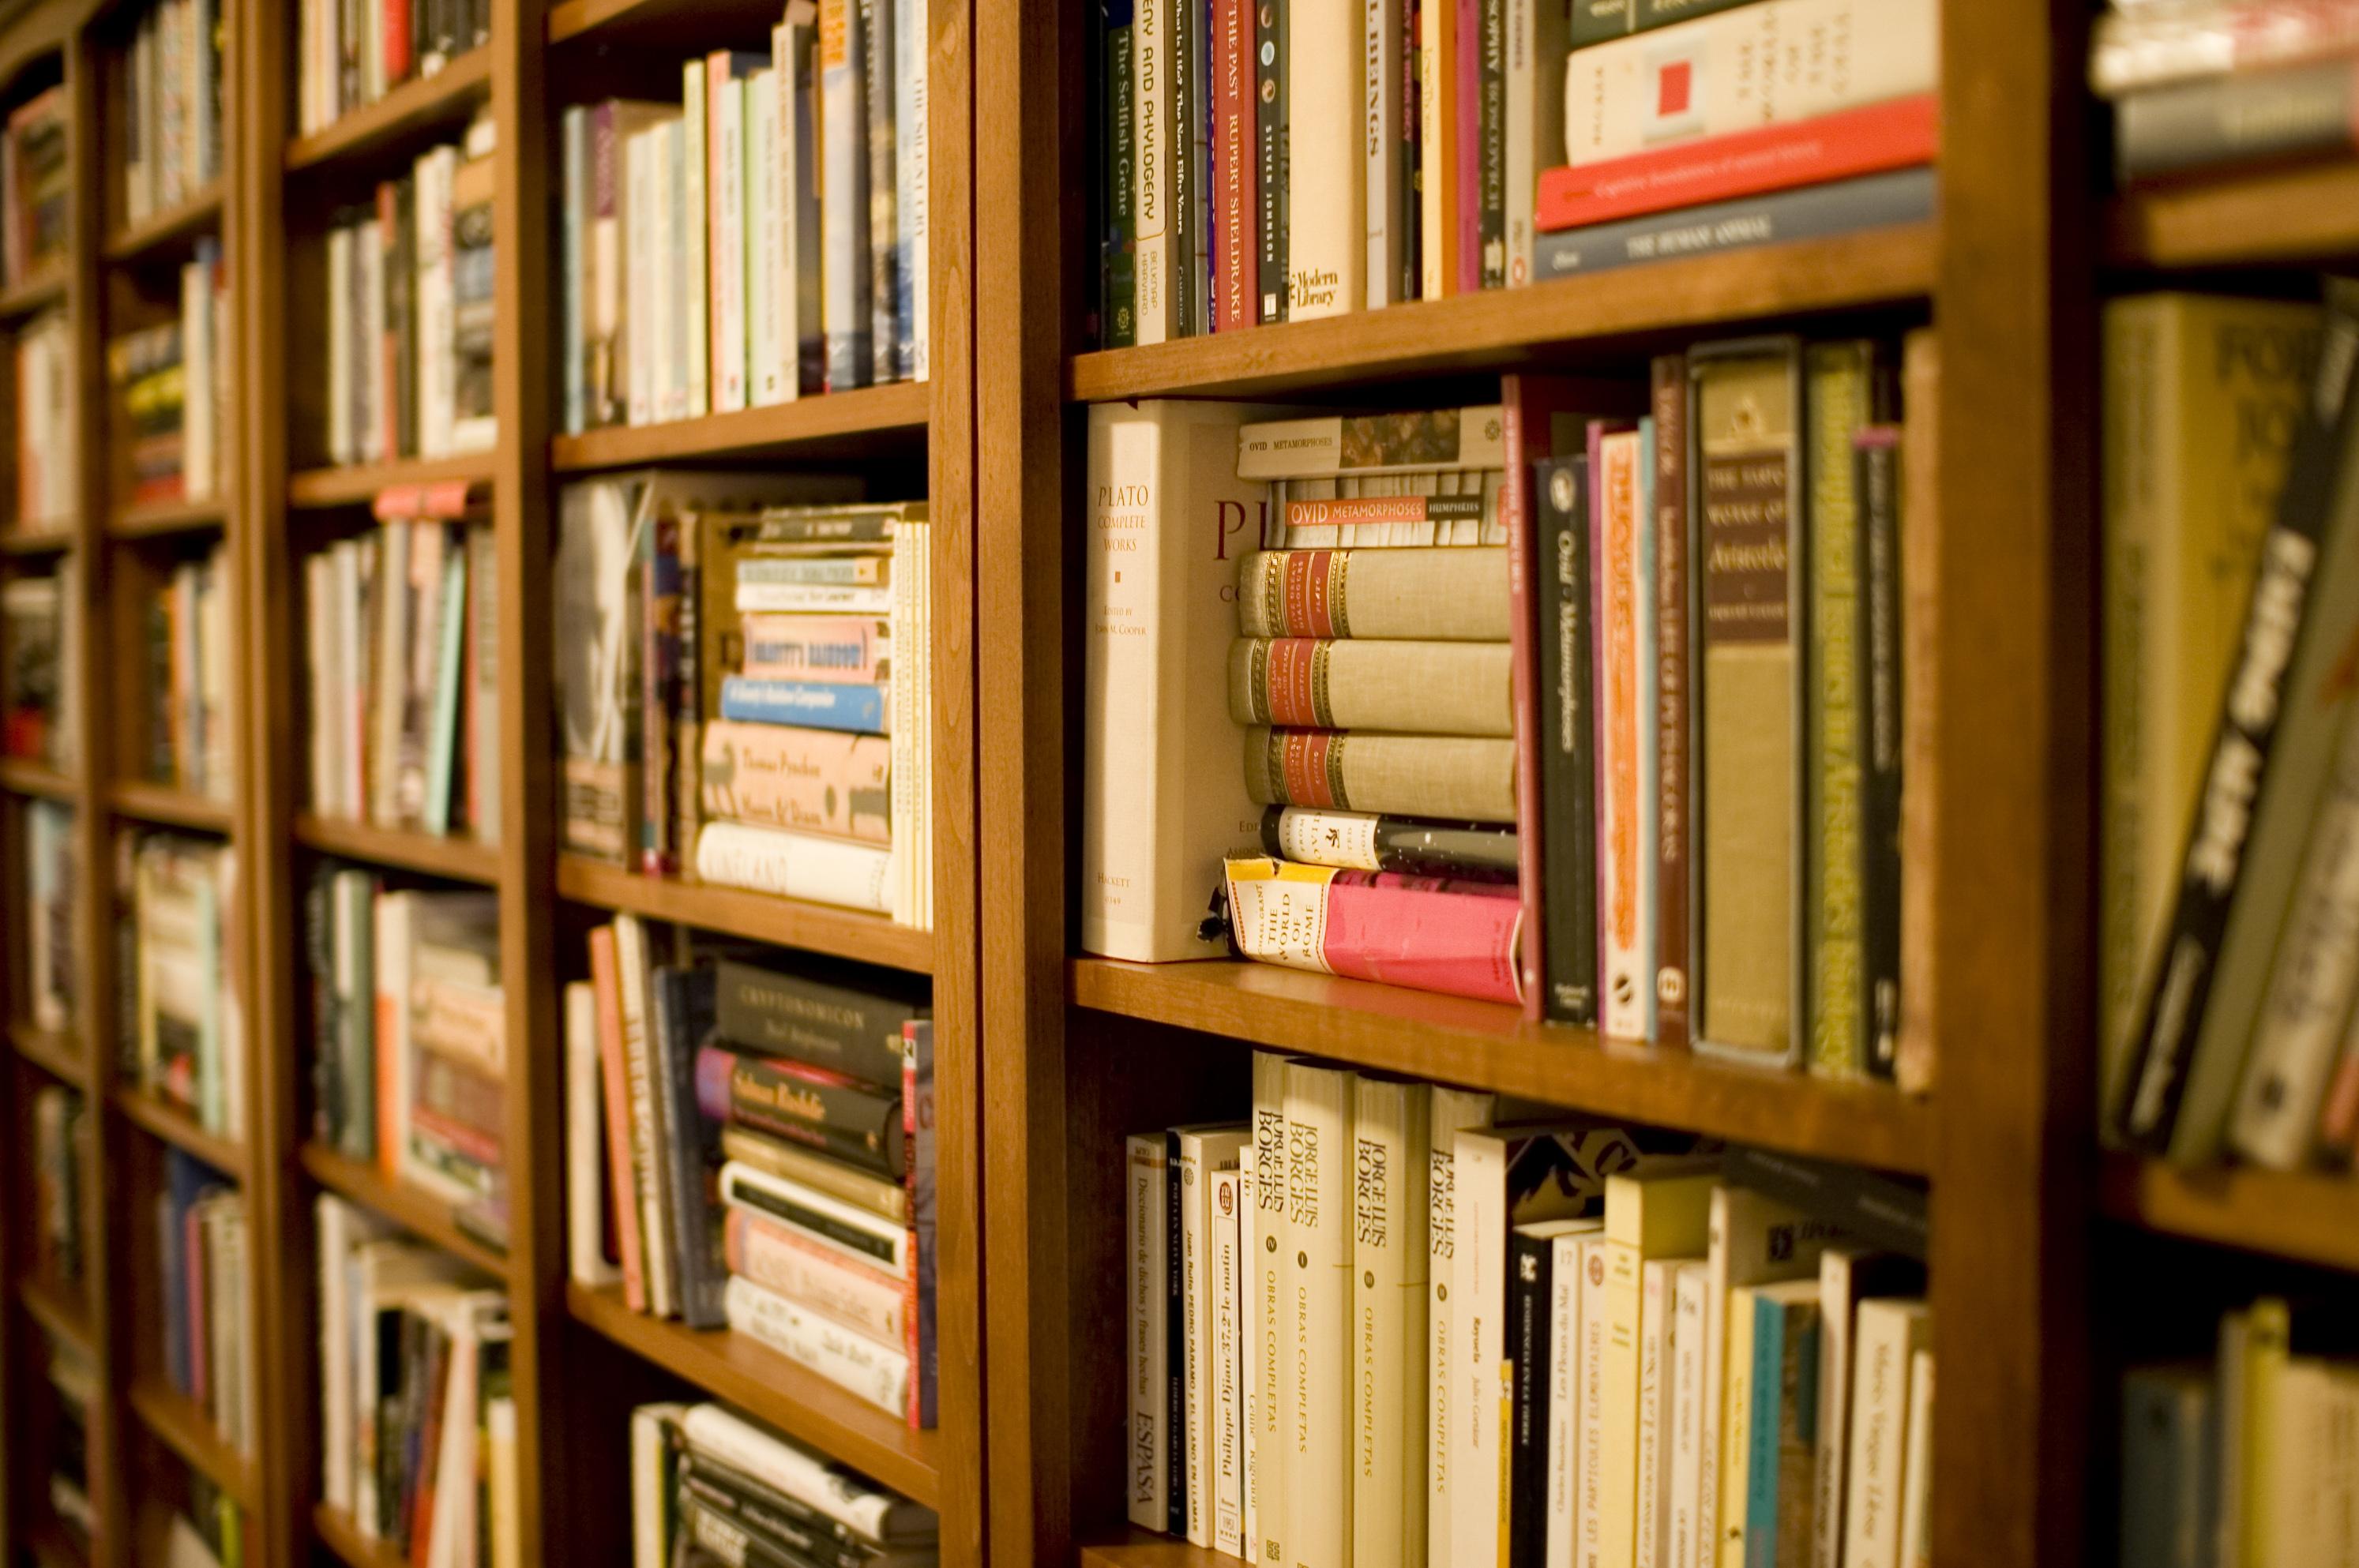 Filebookshelf Wikimedia Commons In Bookshelves (#11 of 15)